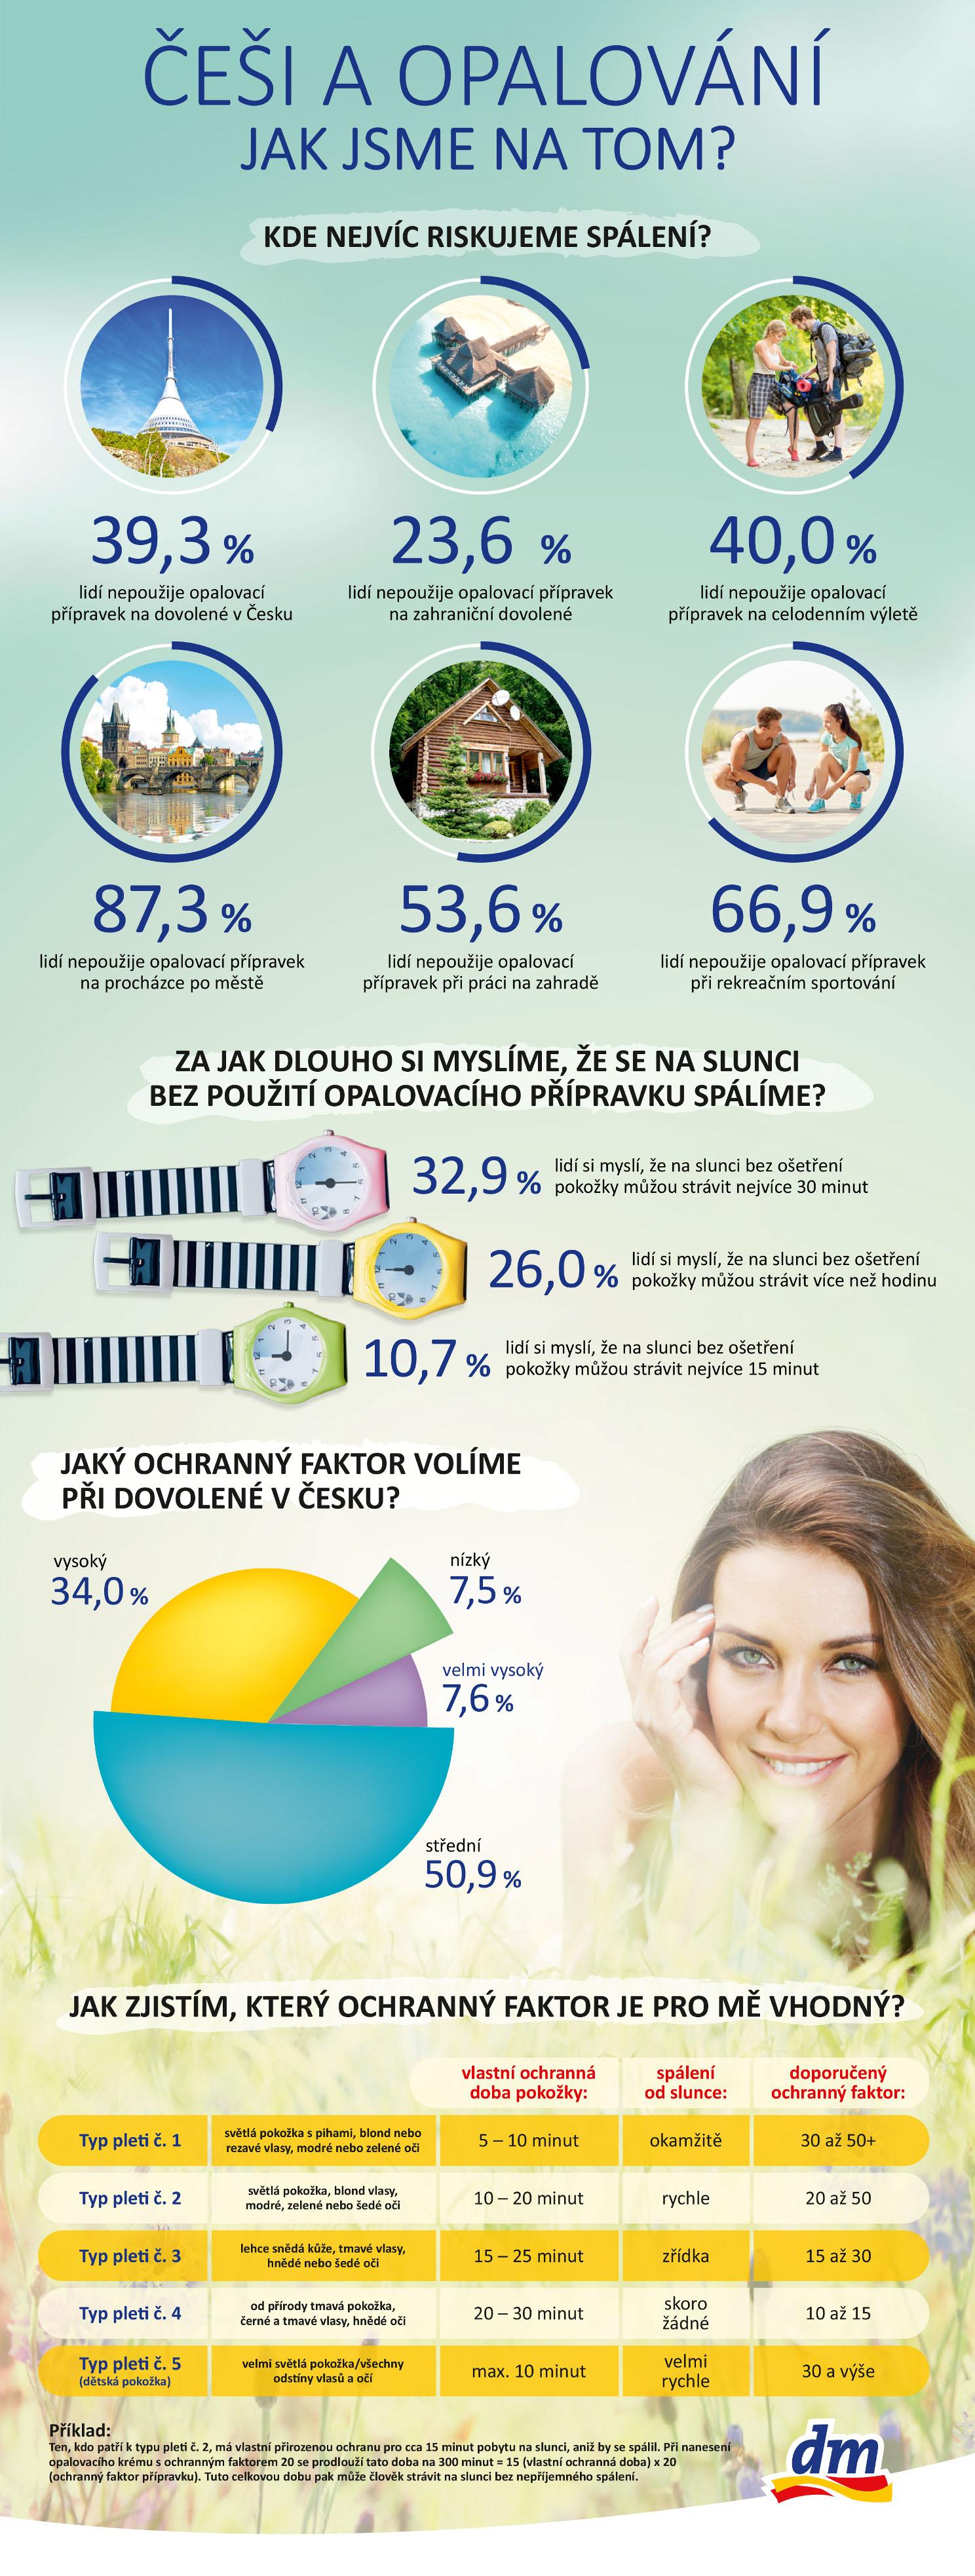 58267-dm-drogerie-markt-infografika-k-pruzkumu